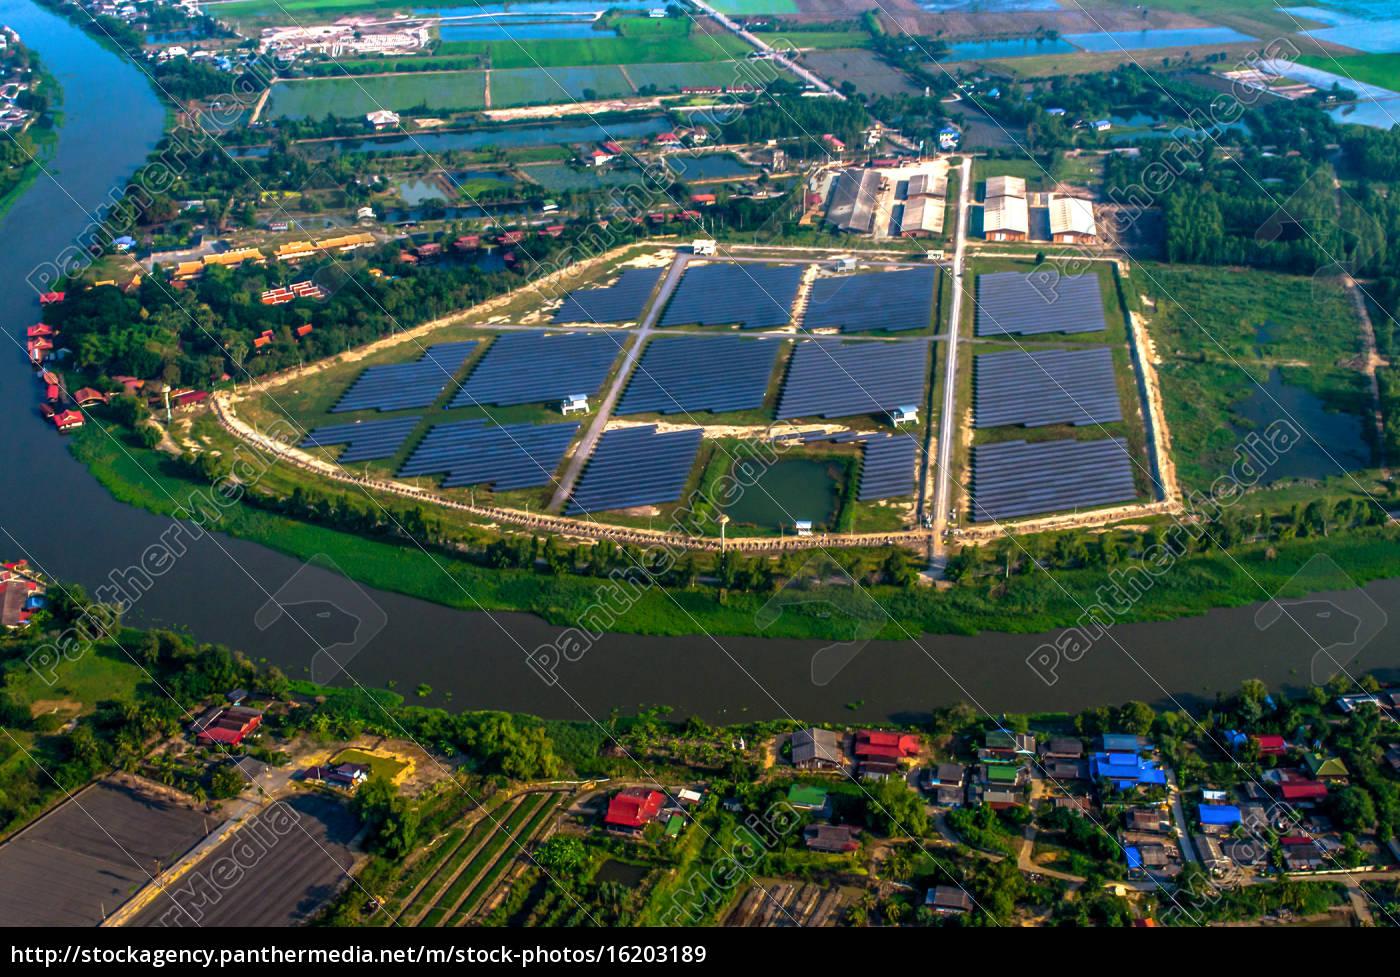 granja, solar, paneles, solares, foto, del, aire - 16203189